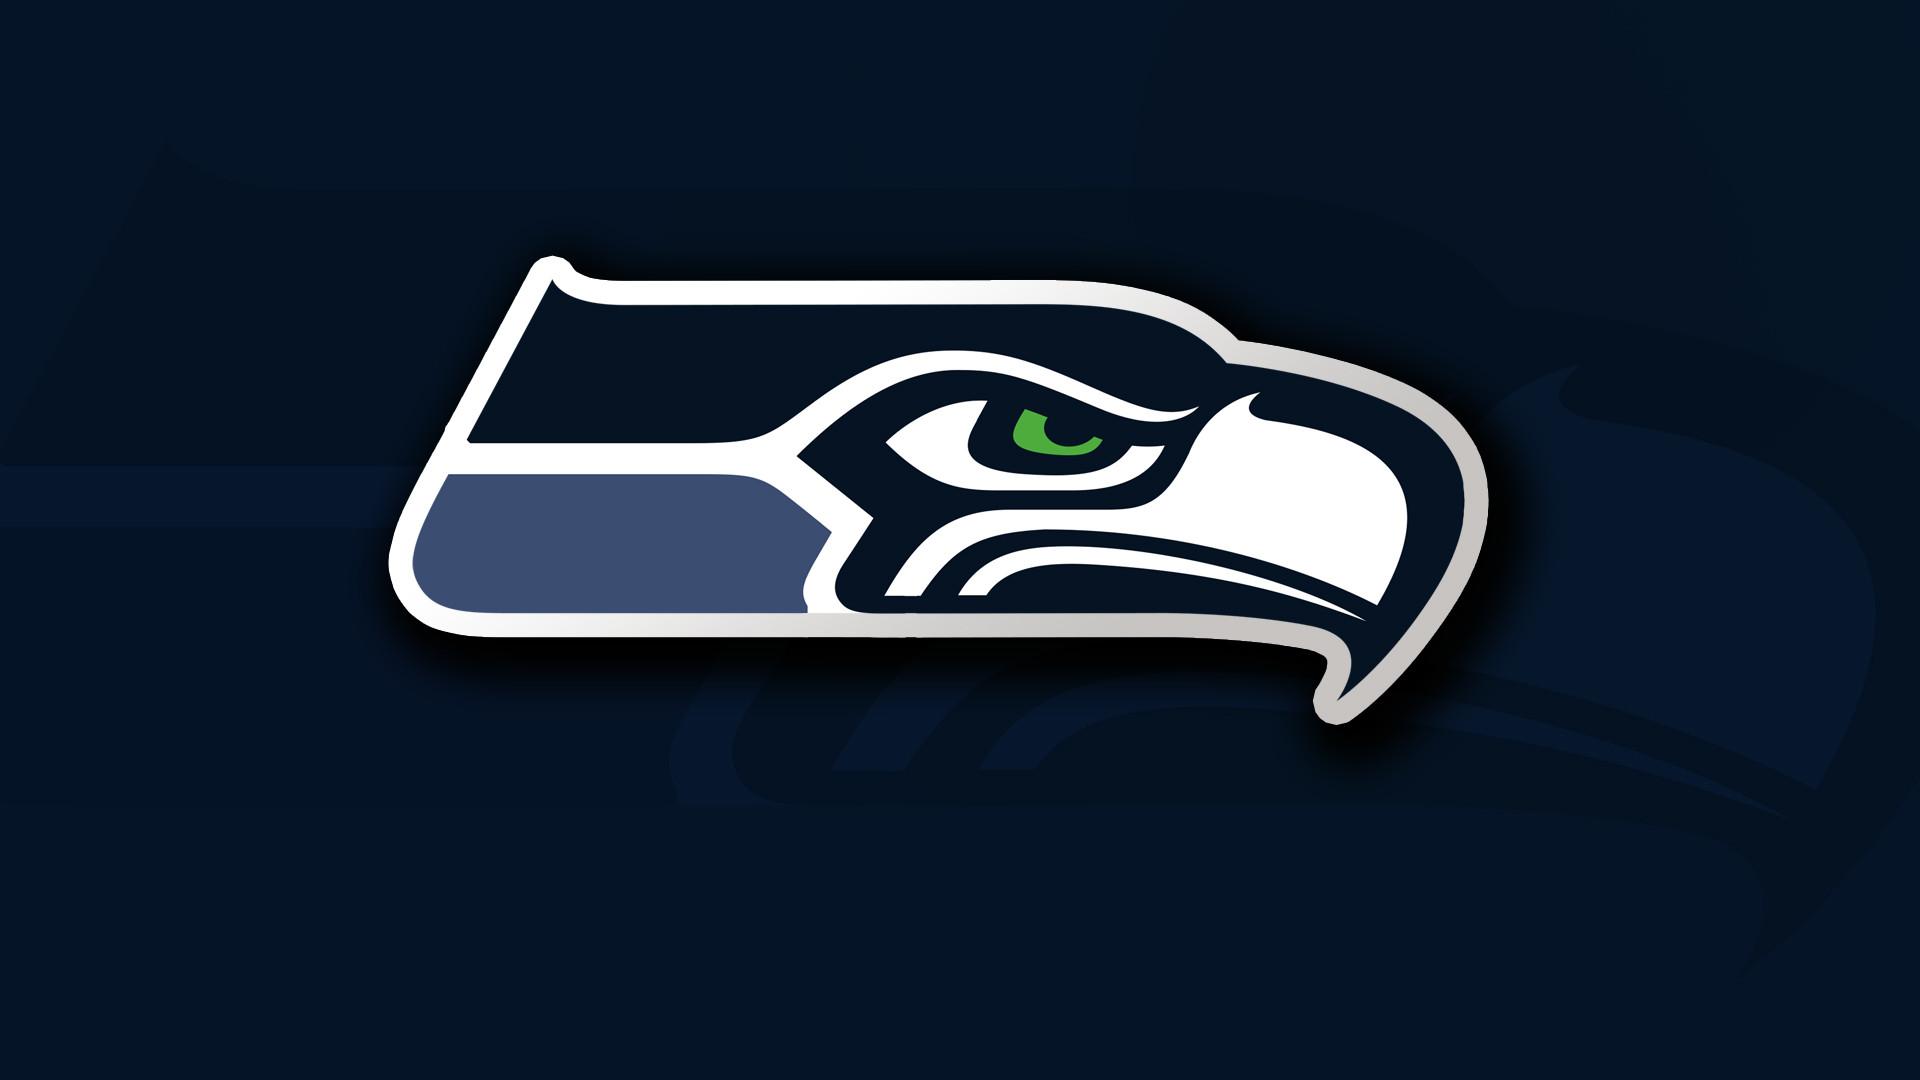 Seahawks Logo Wallpaper Pics (69+ images).